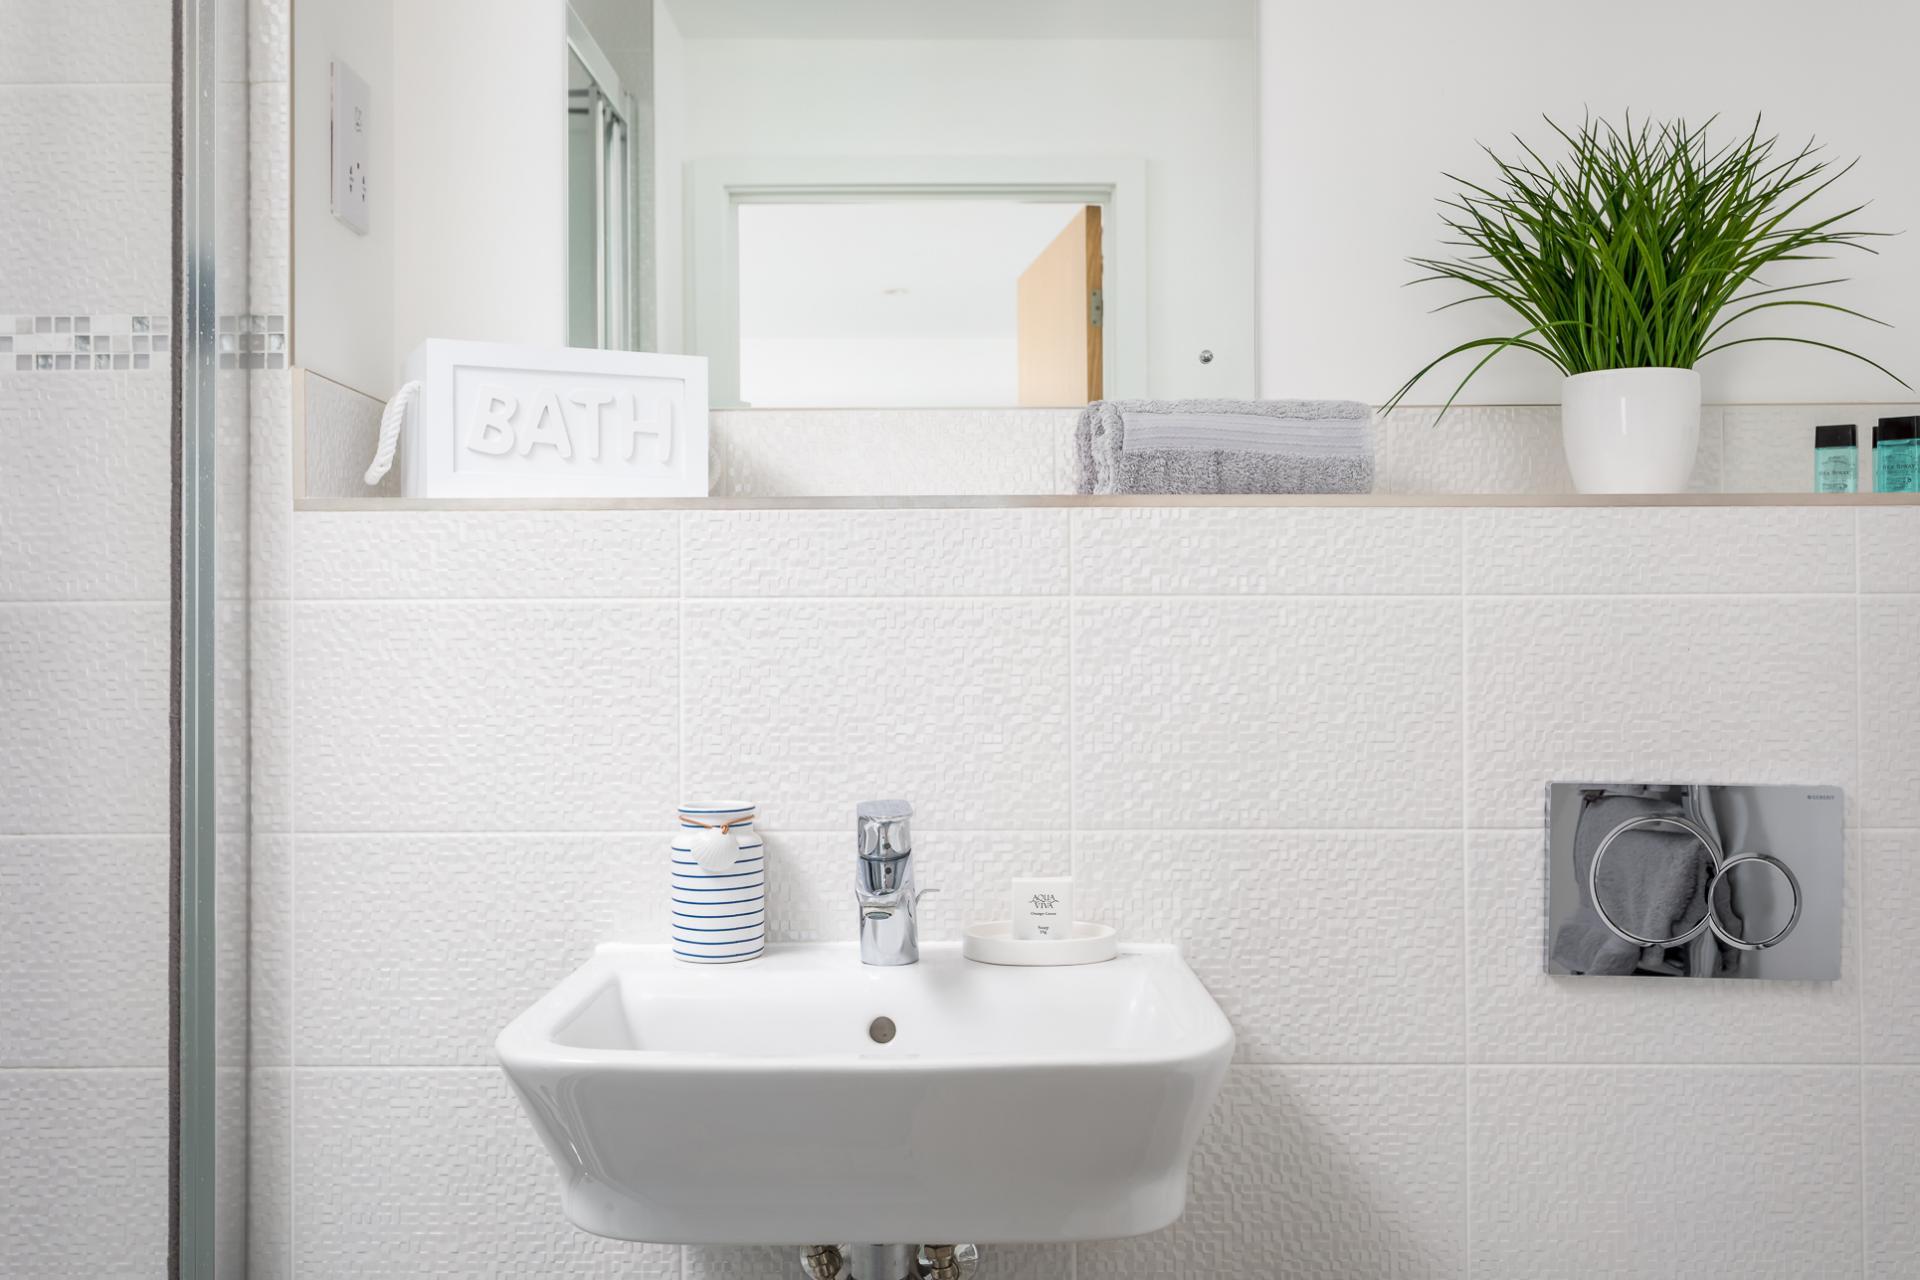 Sink at Prince Regent Mews Apartment